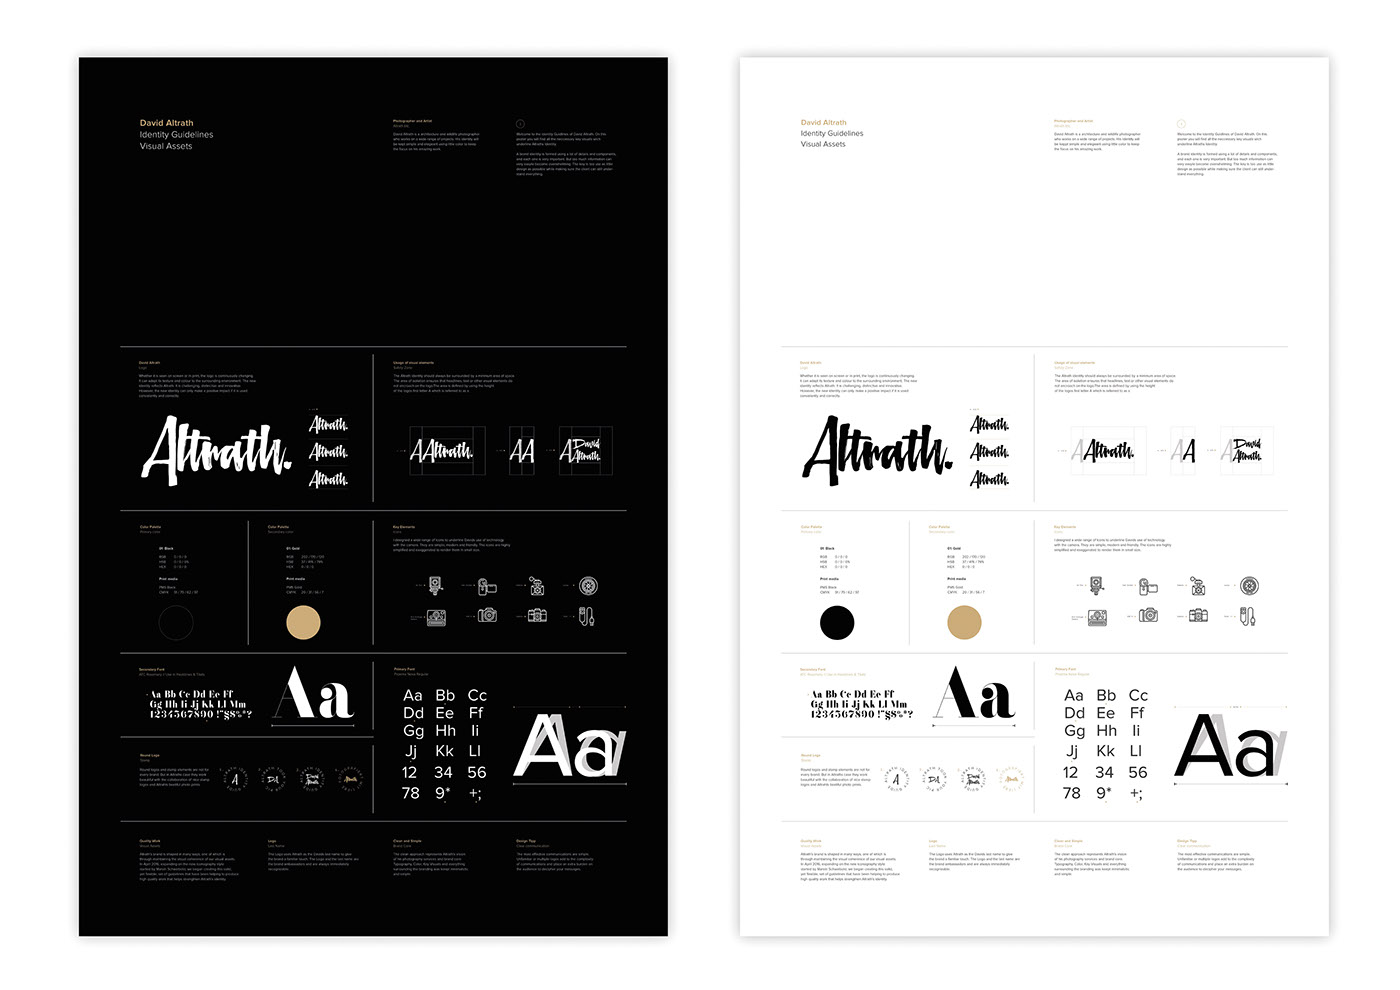 branding ,design,Webdesign,Screendesign,UI/UX,CI,corporatedesign,Photography